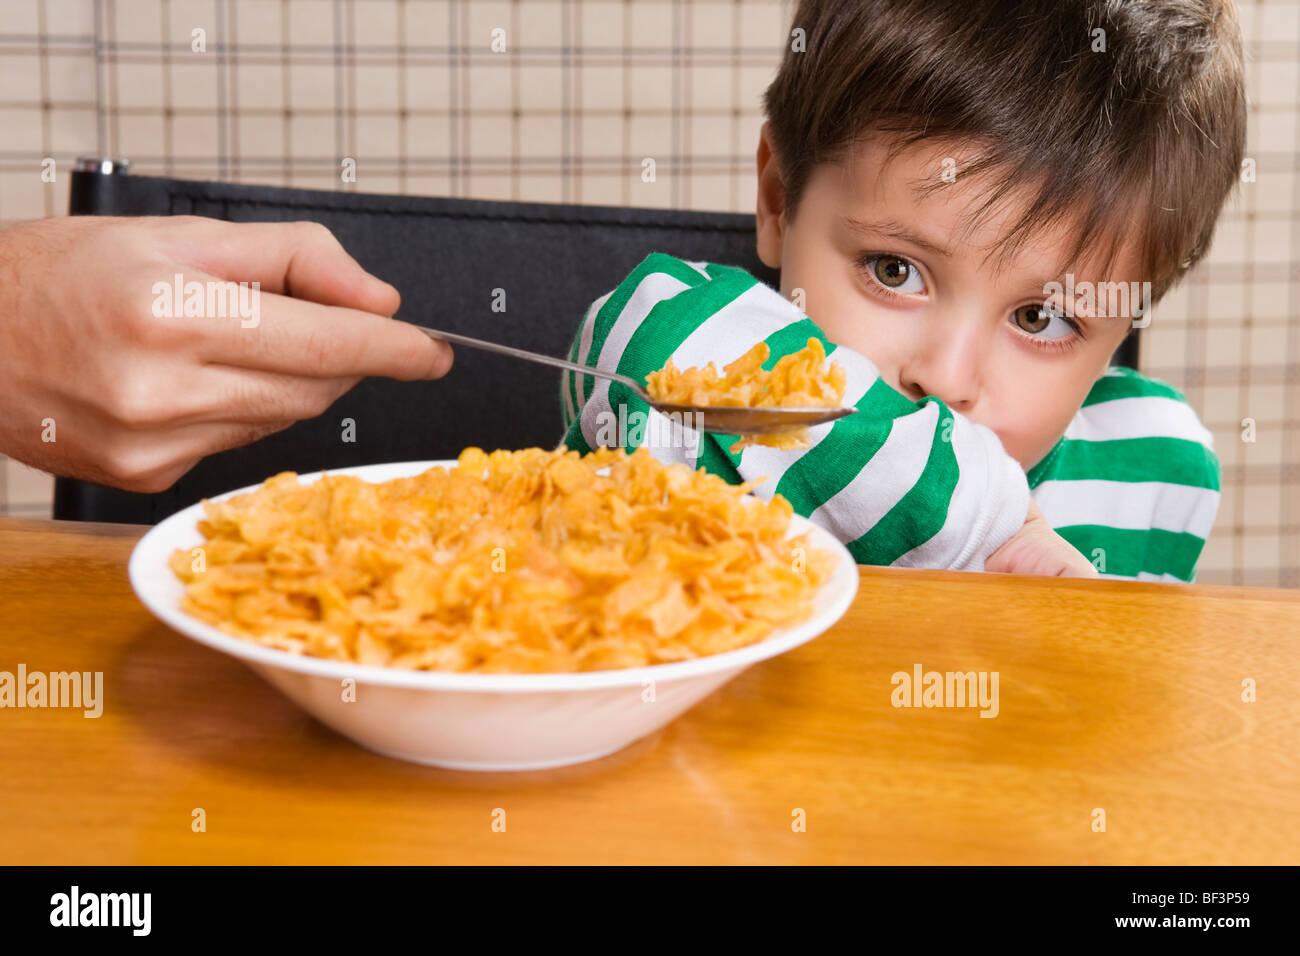 Close-up of a Boy refusant les flocons de maïs Photo Stock